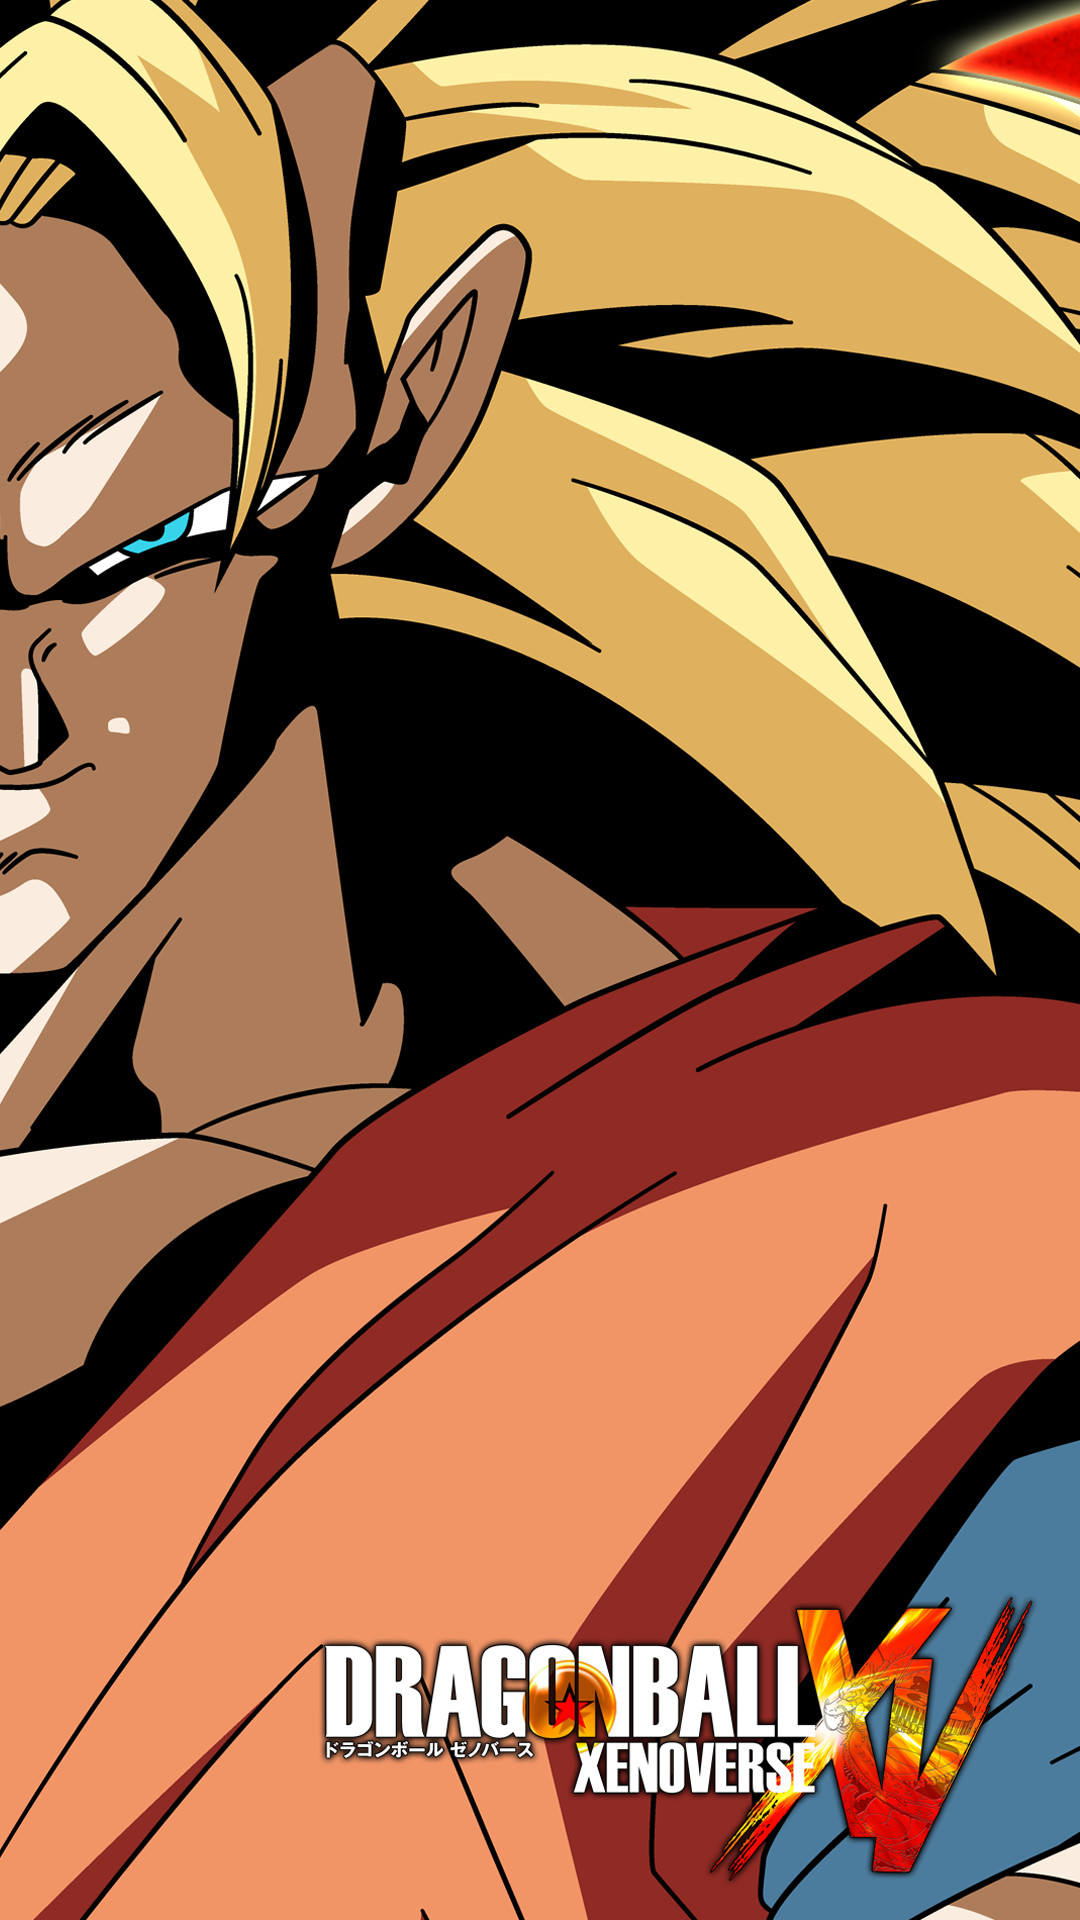 … SSJ3 Goku Xenoverse Phone Wallpaper by RayzorBlade189